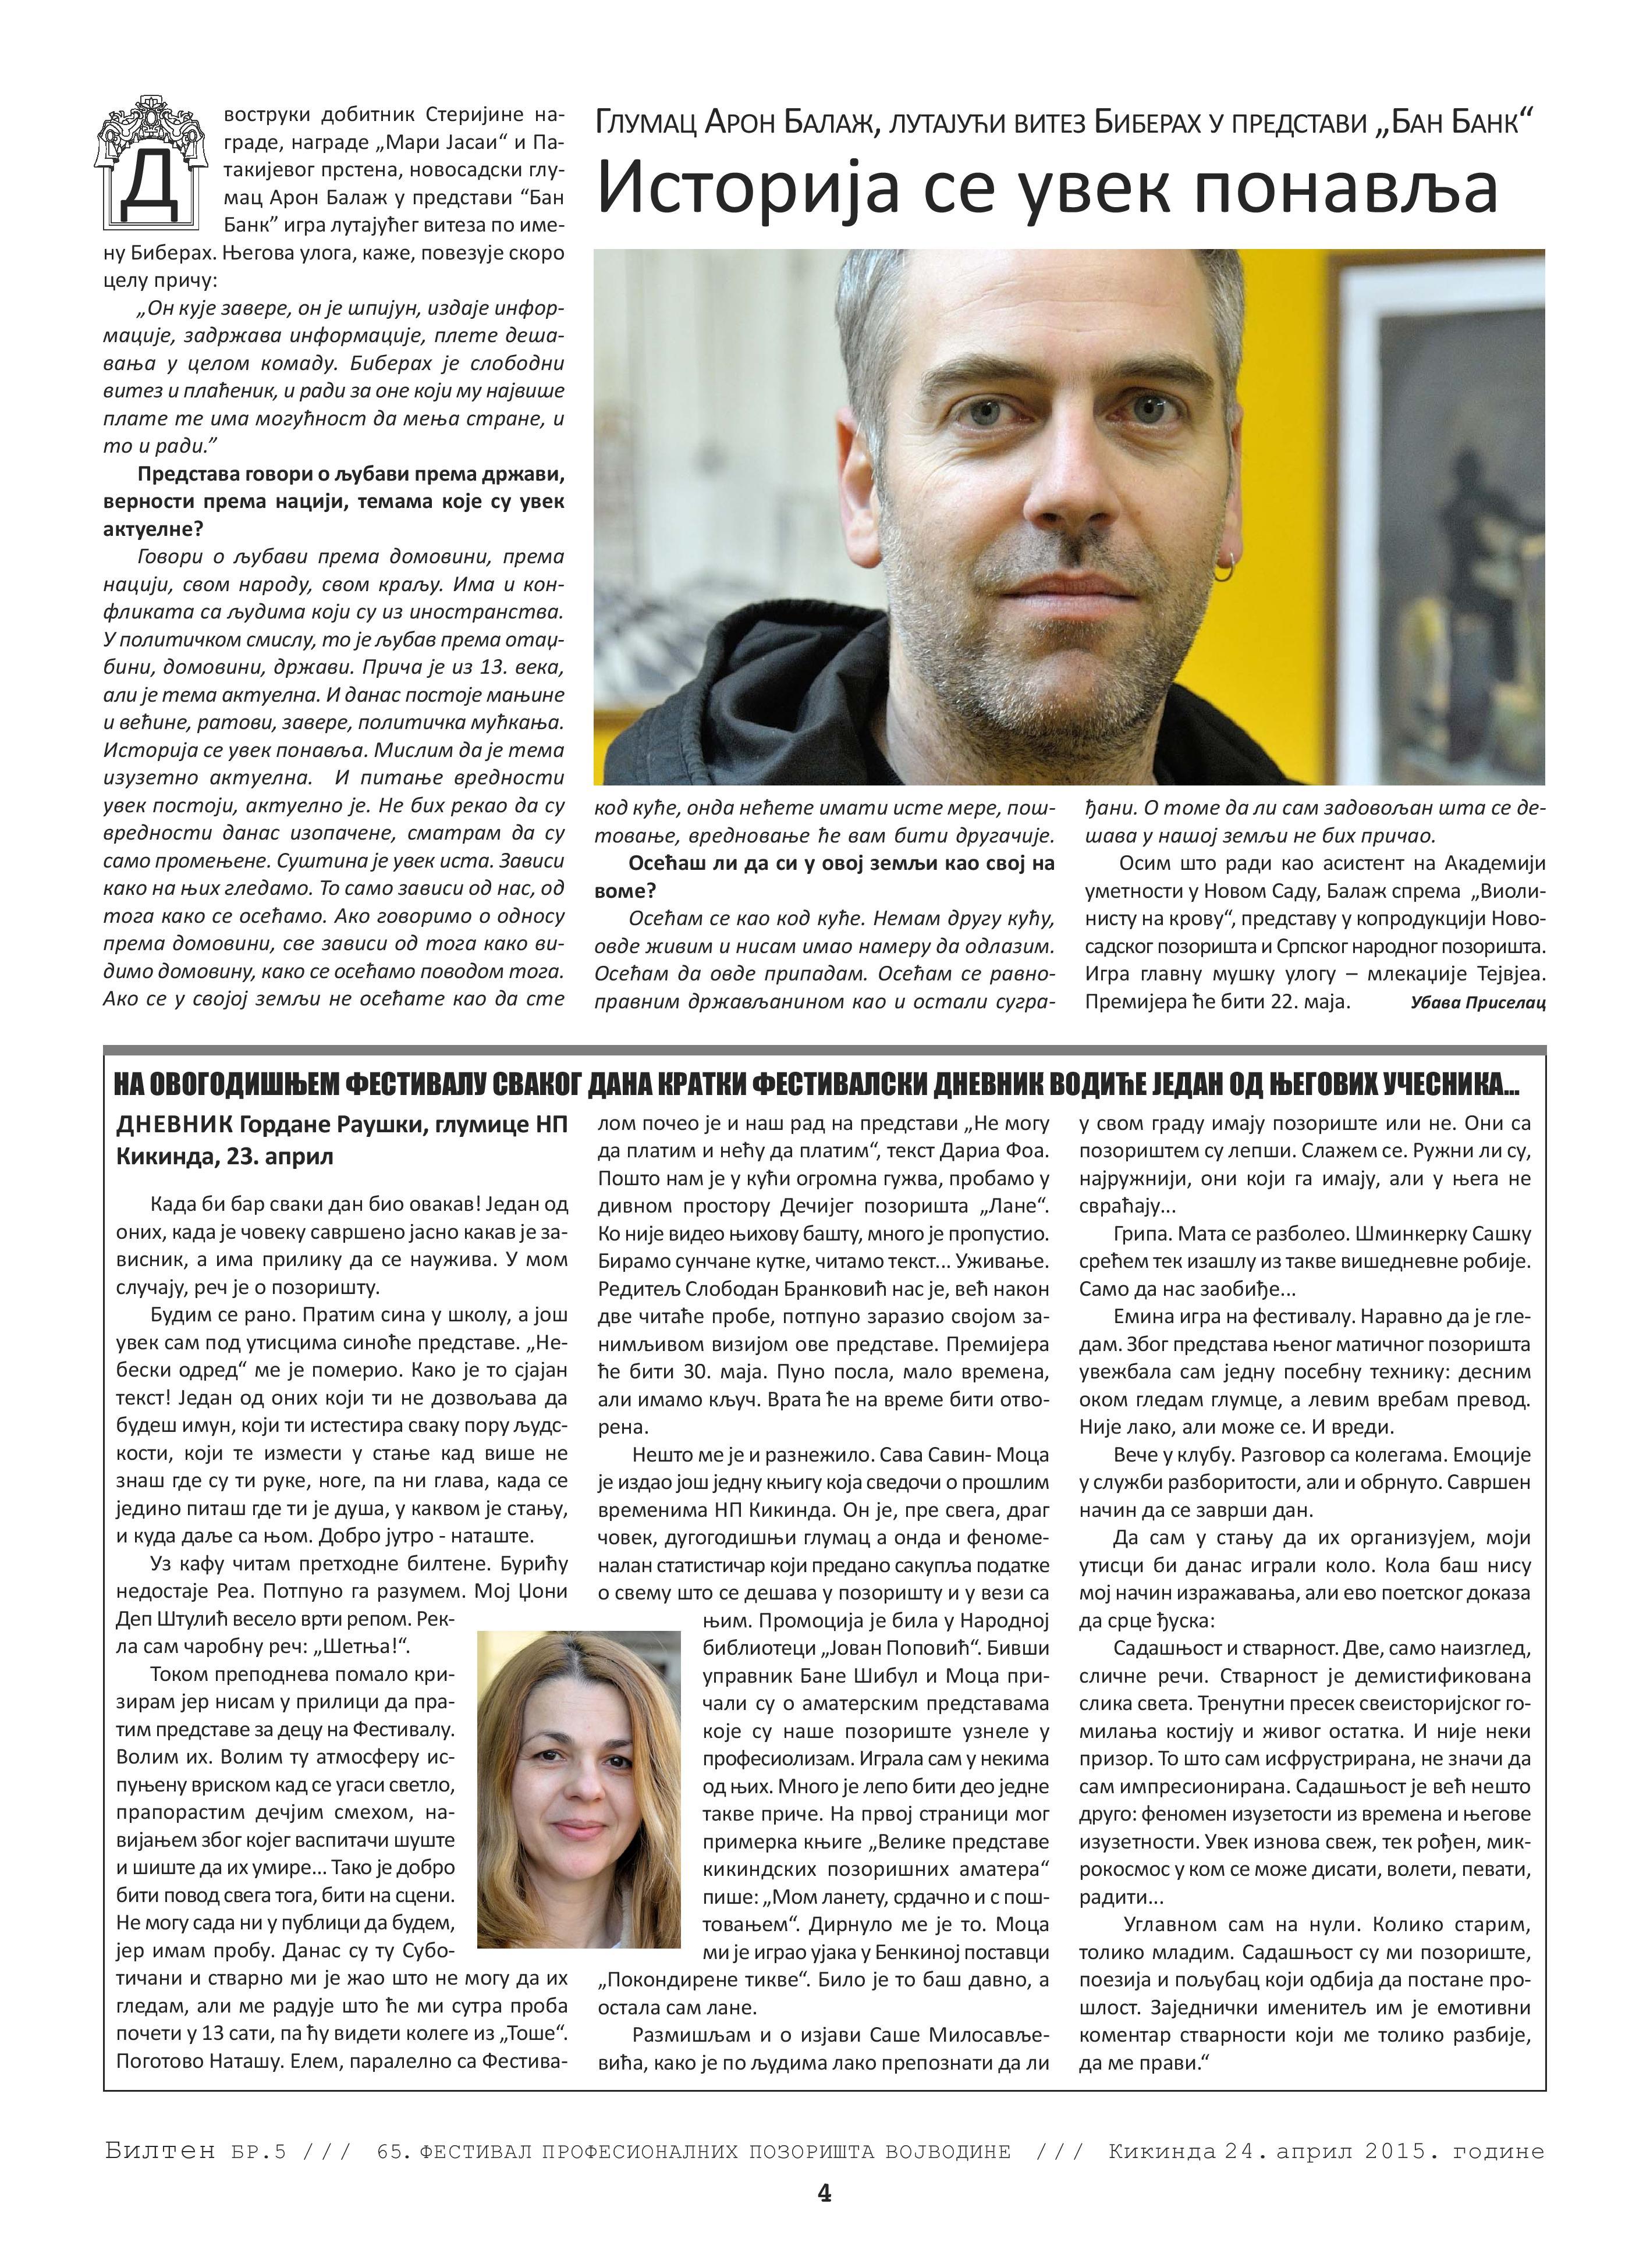 BILTEN_05_24 april-page-004